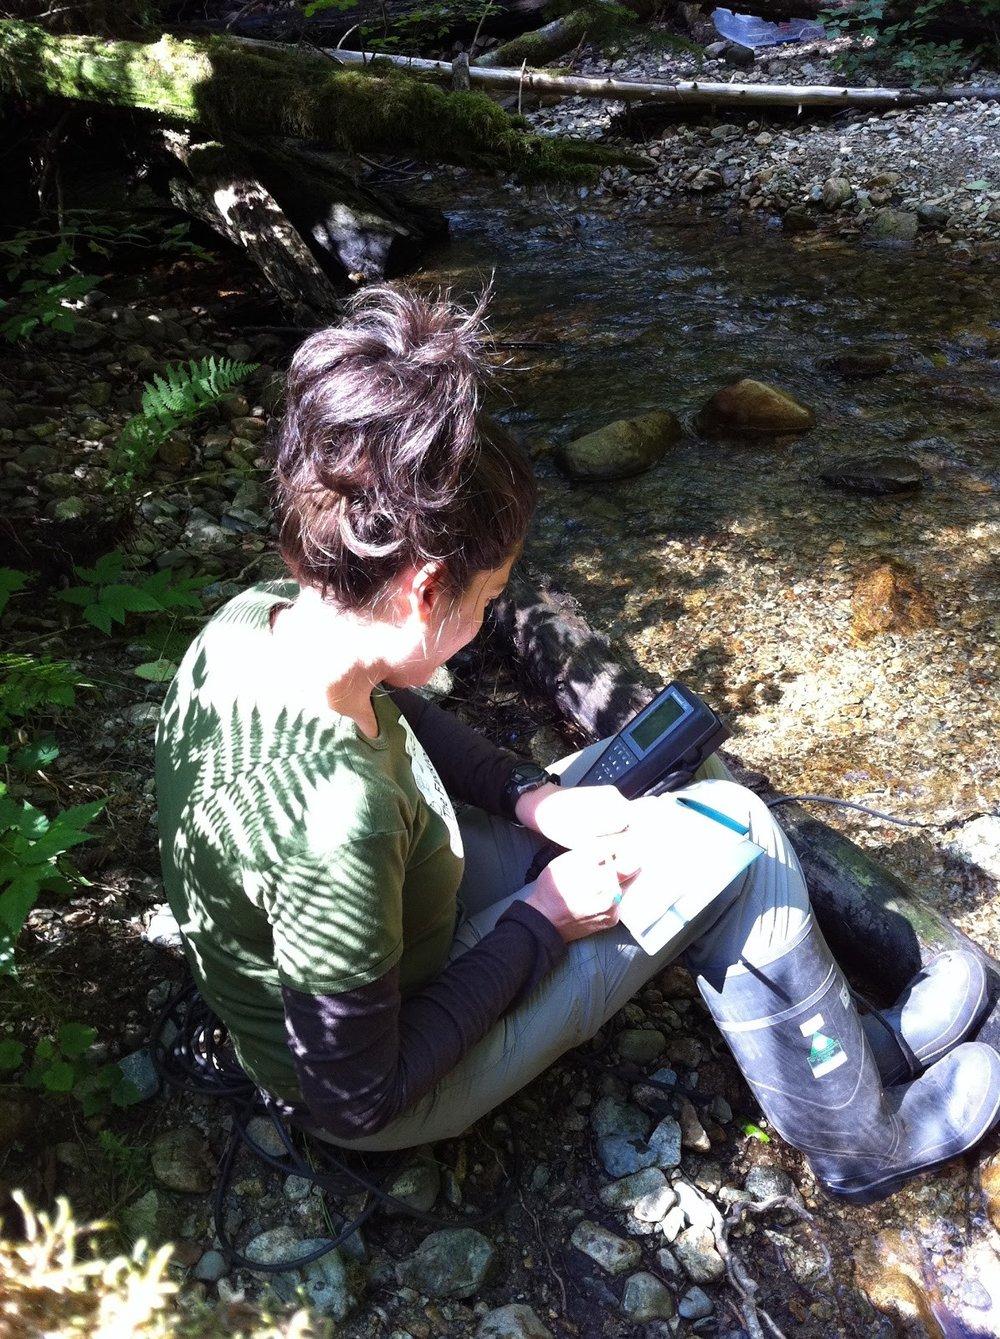 Measuring nutrient uptake in beautiful British Columbia, summer 2012